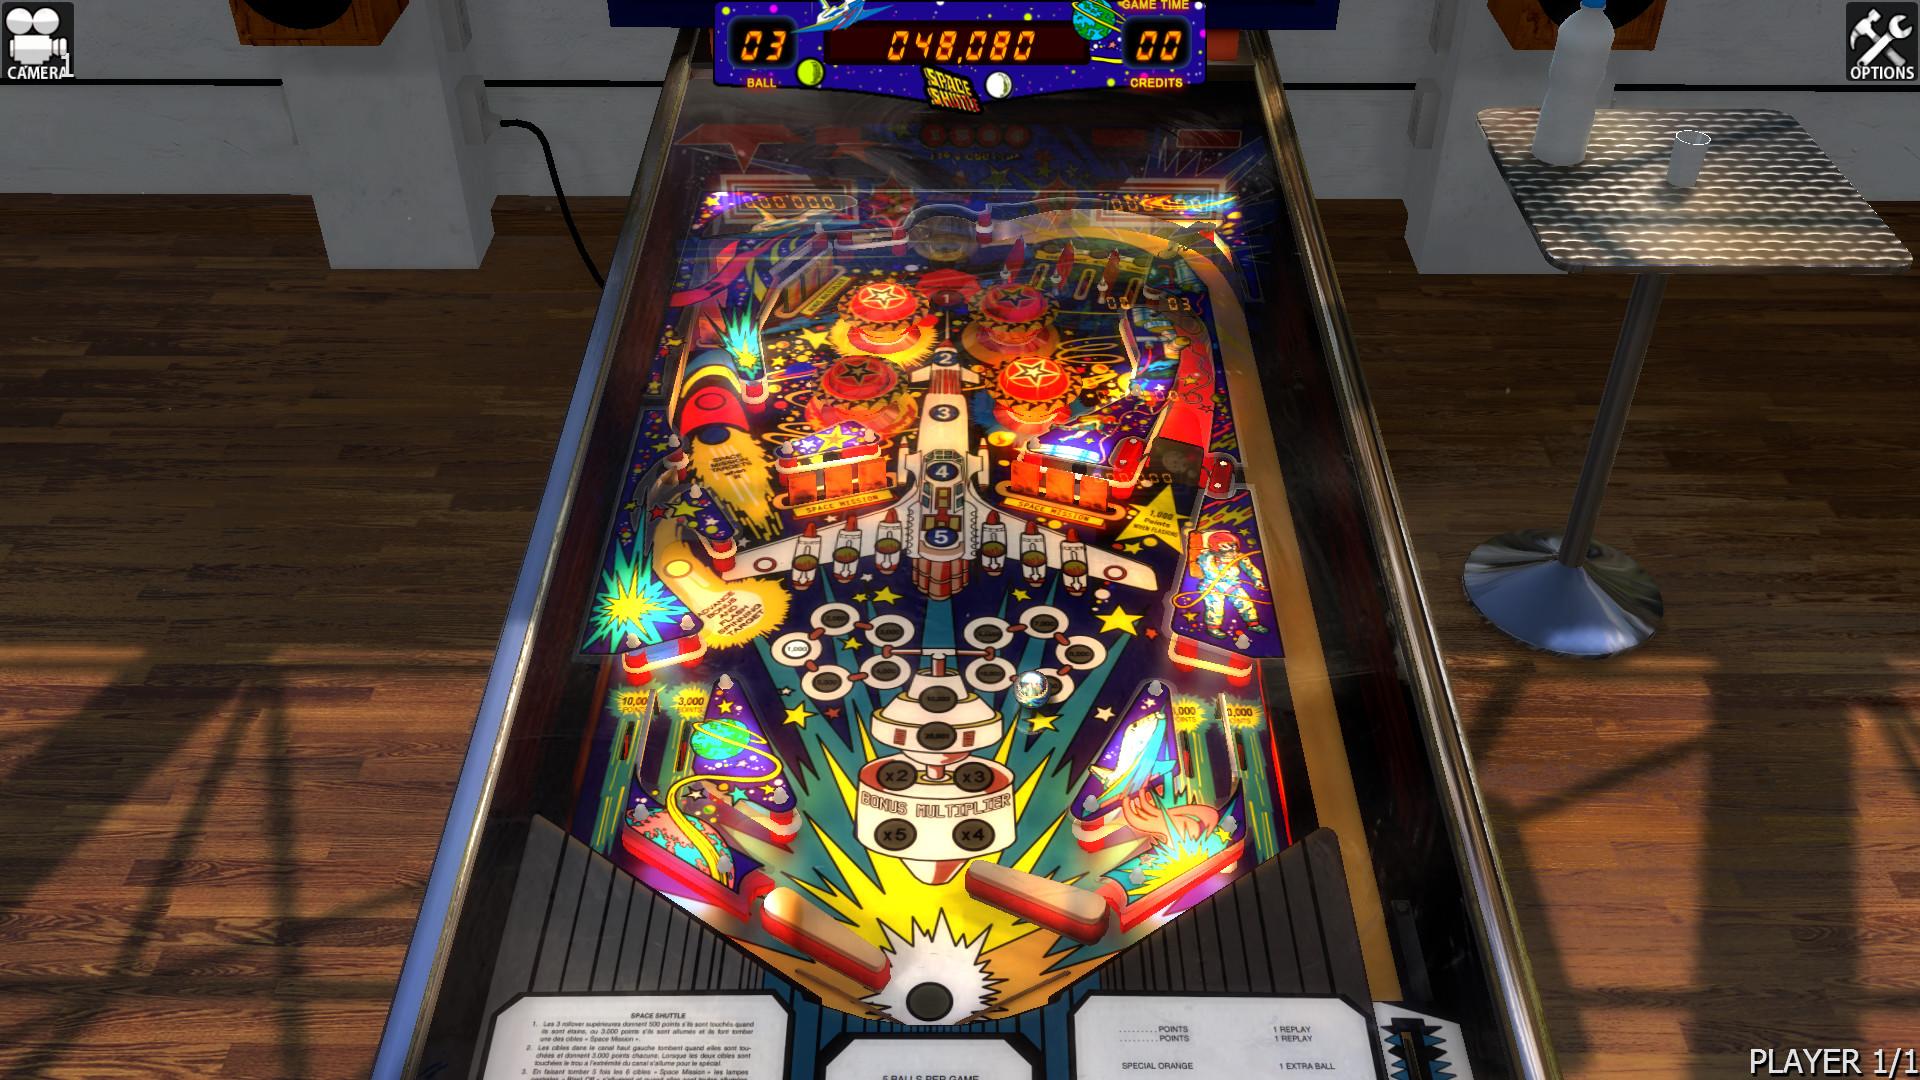 Zaccaria Pinball - Space Shuttle Table screenshot